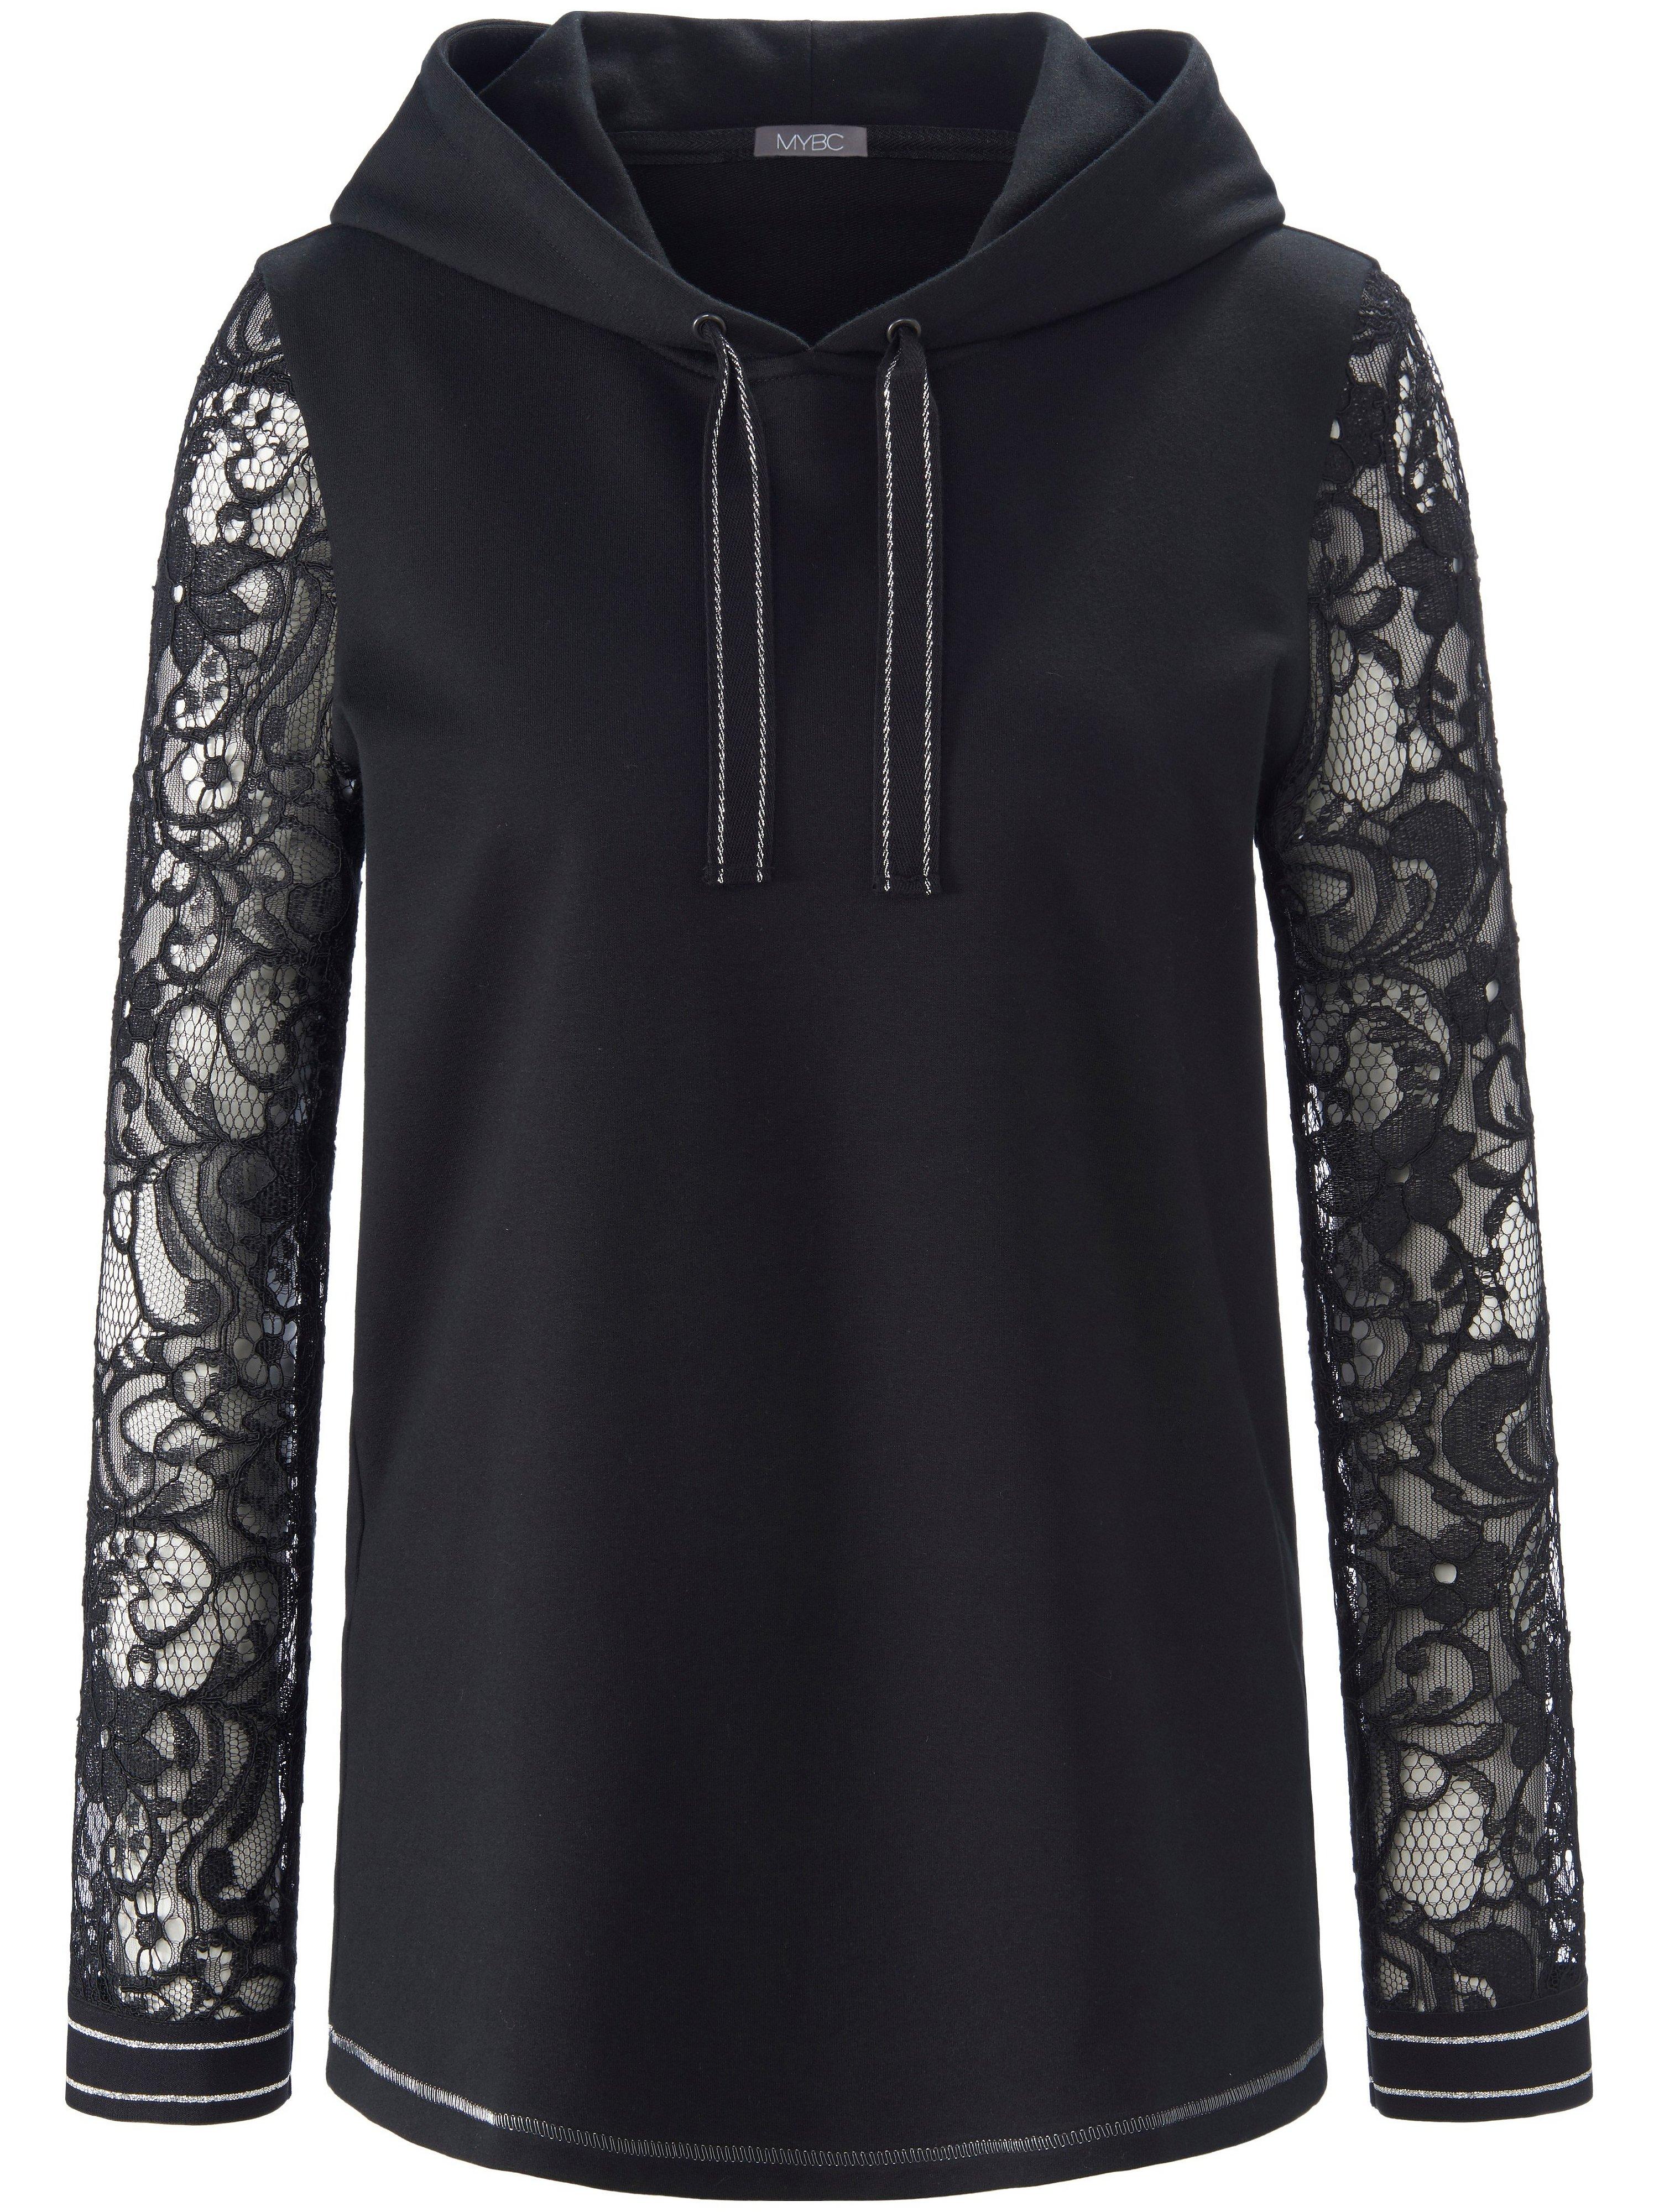 Sweatshirt lange mouwen Van MYBC zwart